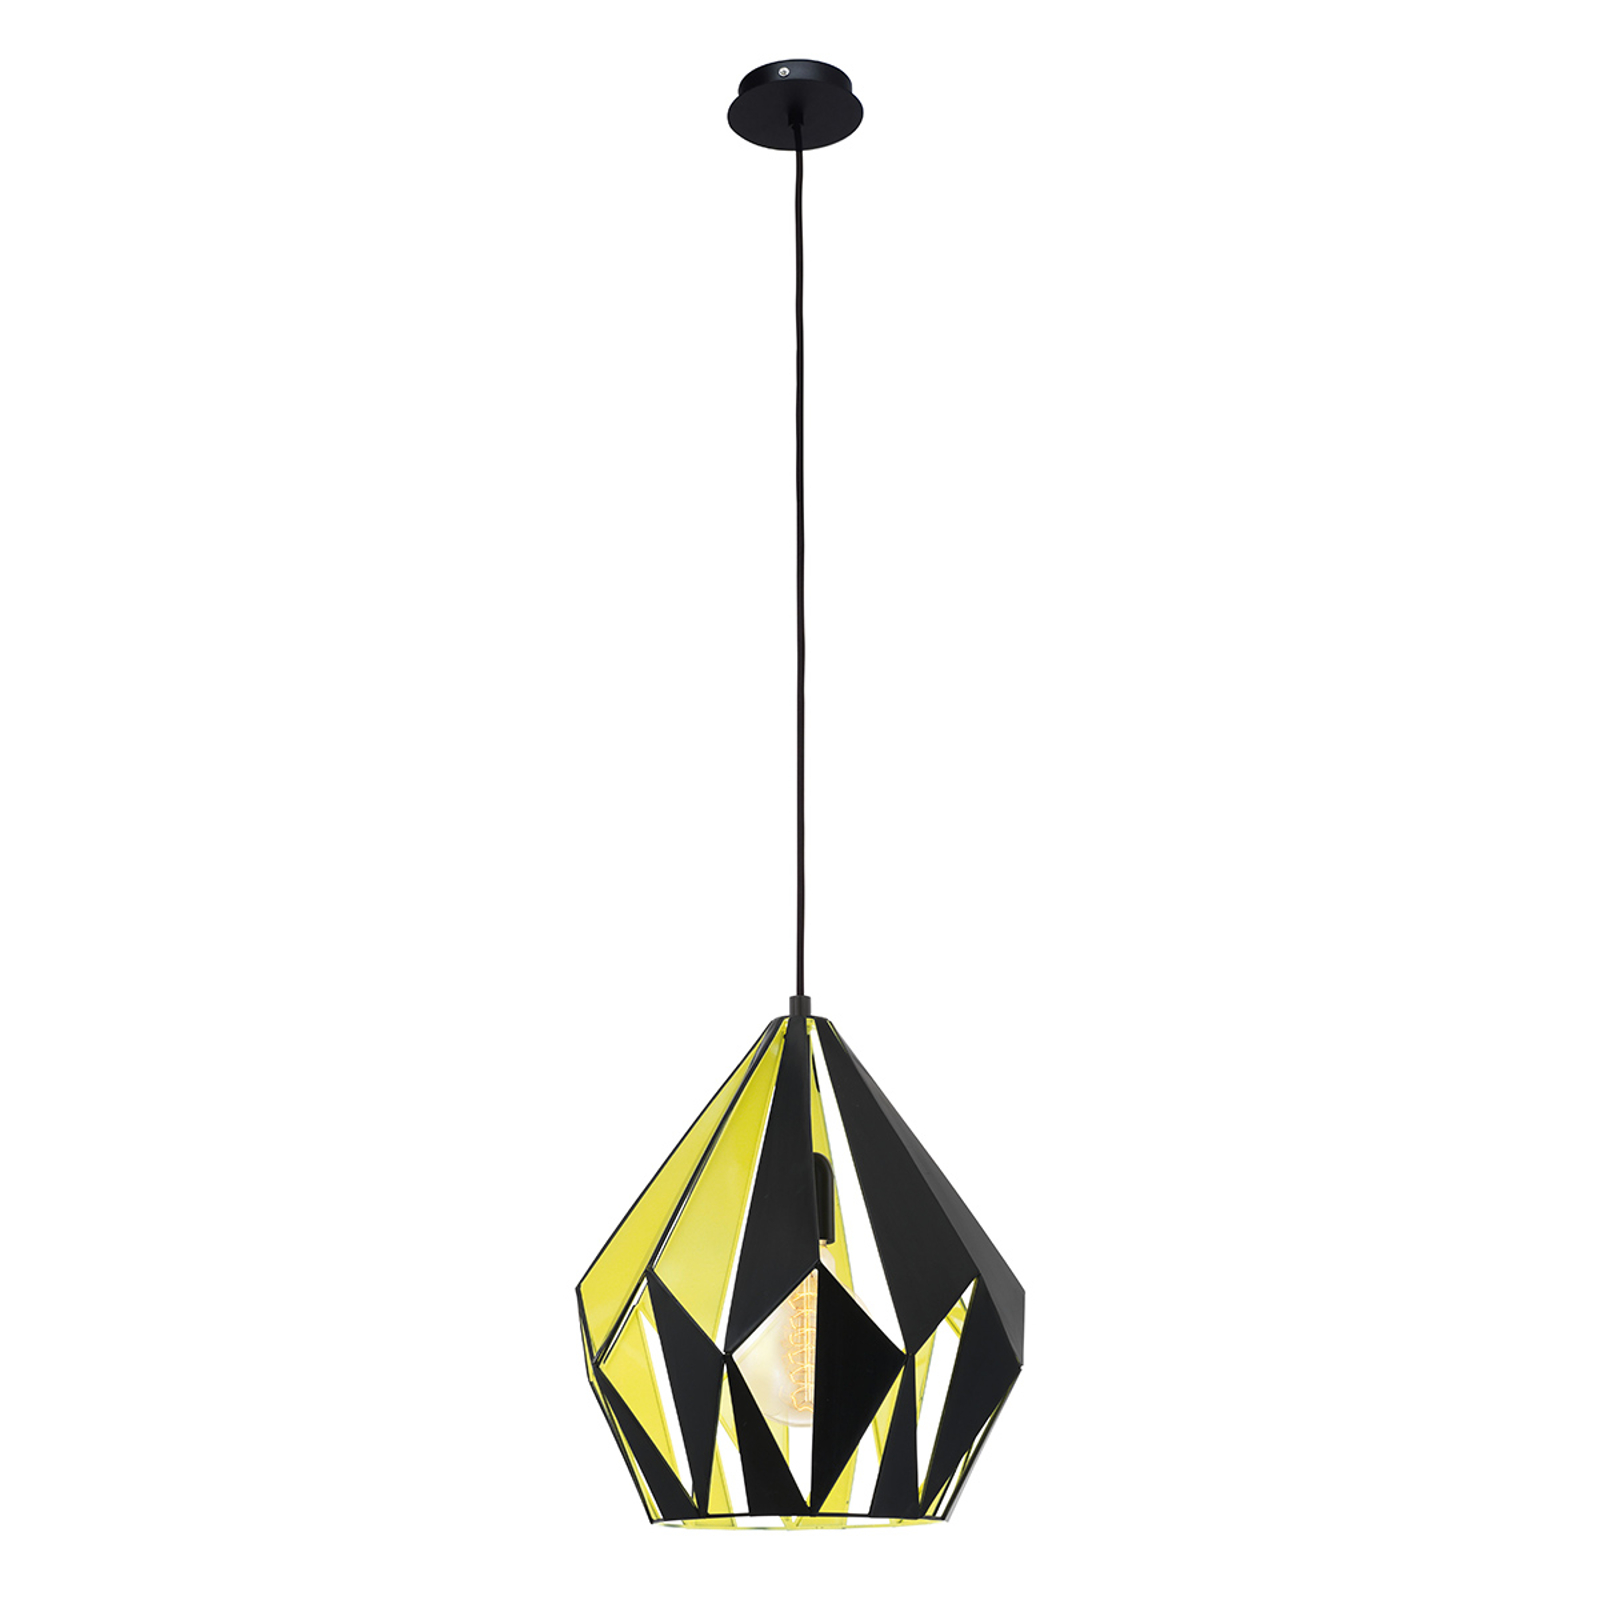 Lampa wisząca Carlton, czarno-żółta